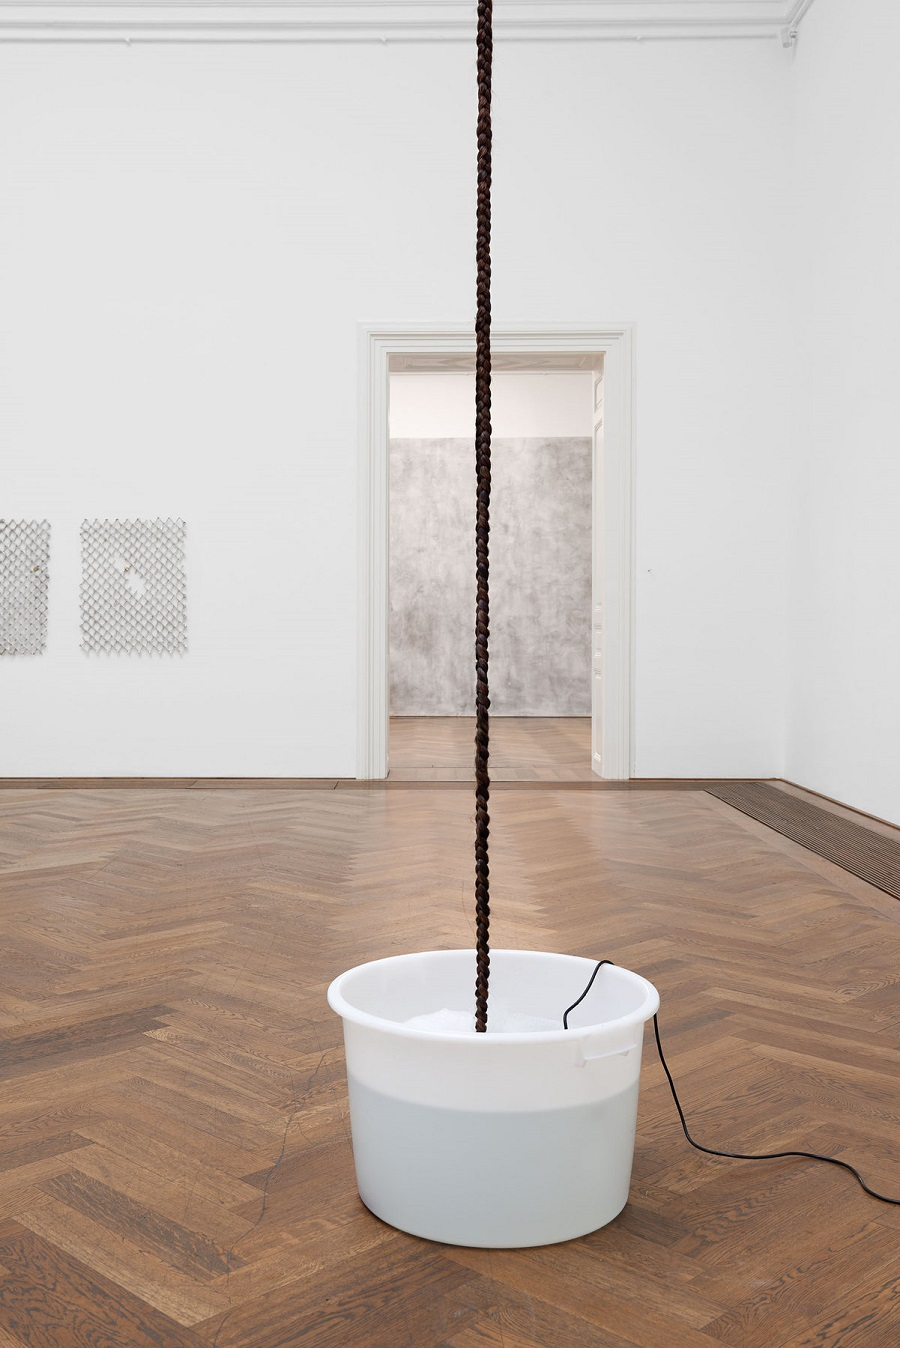 Tania-Perez-Cordova-at-Kunsthalle-Basel-6.jpg